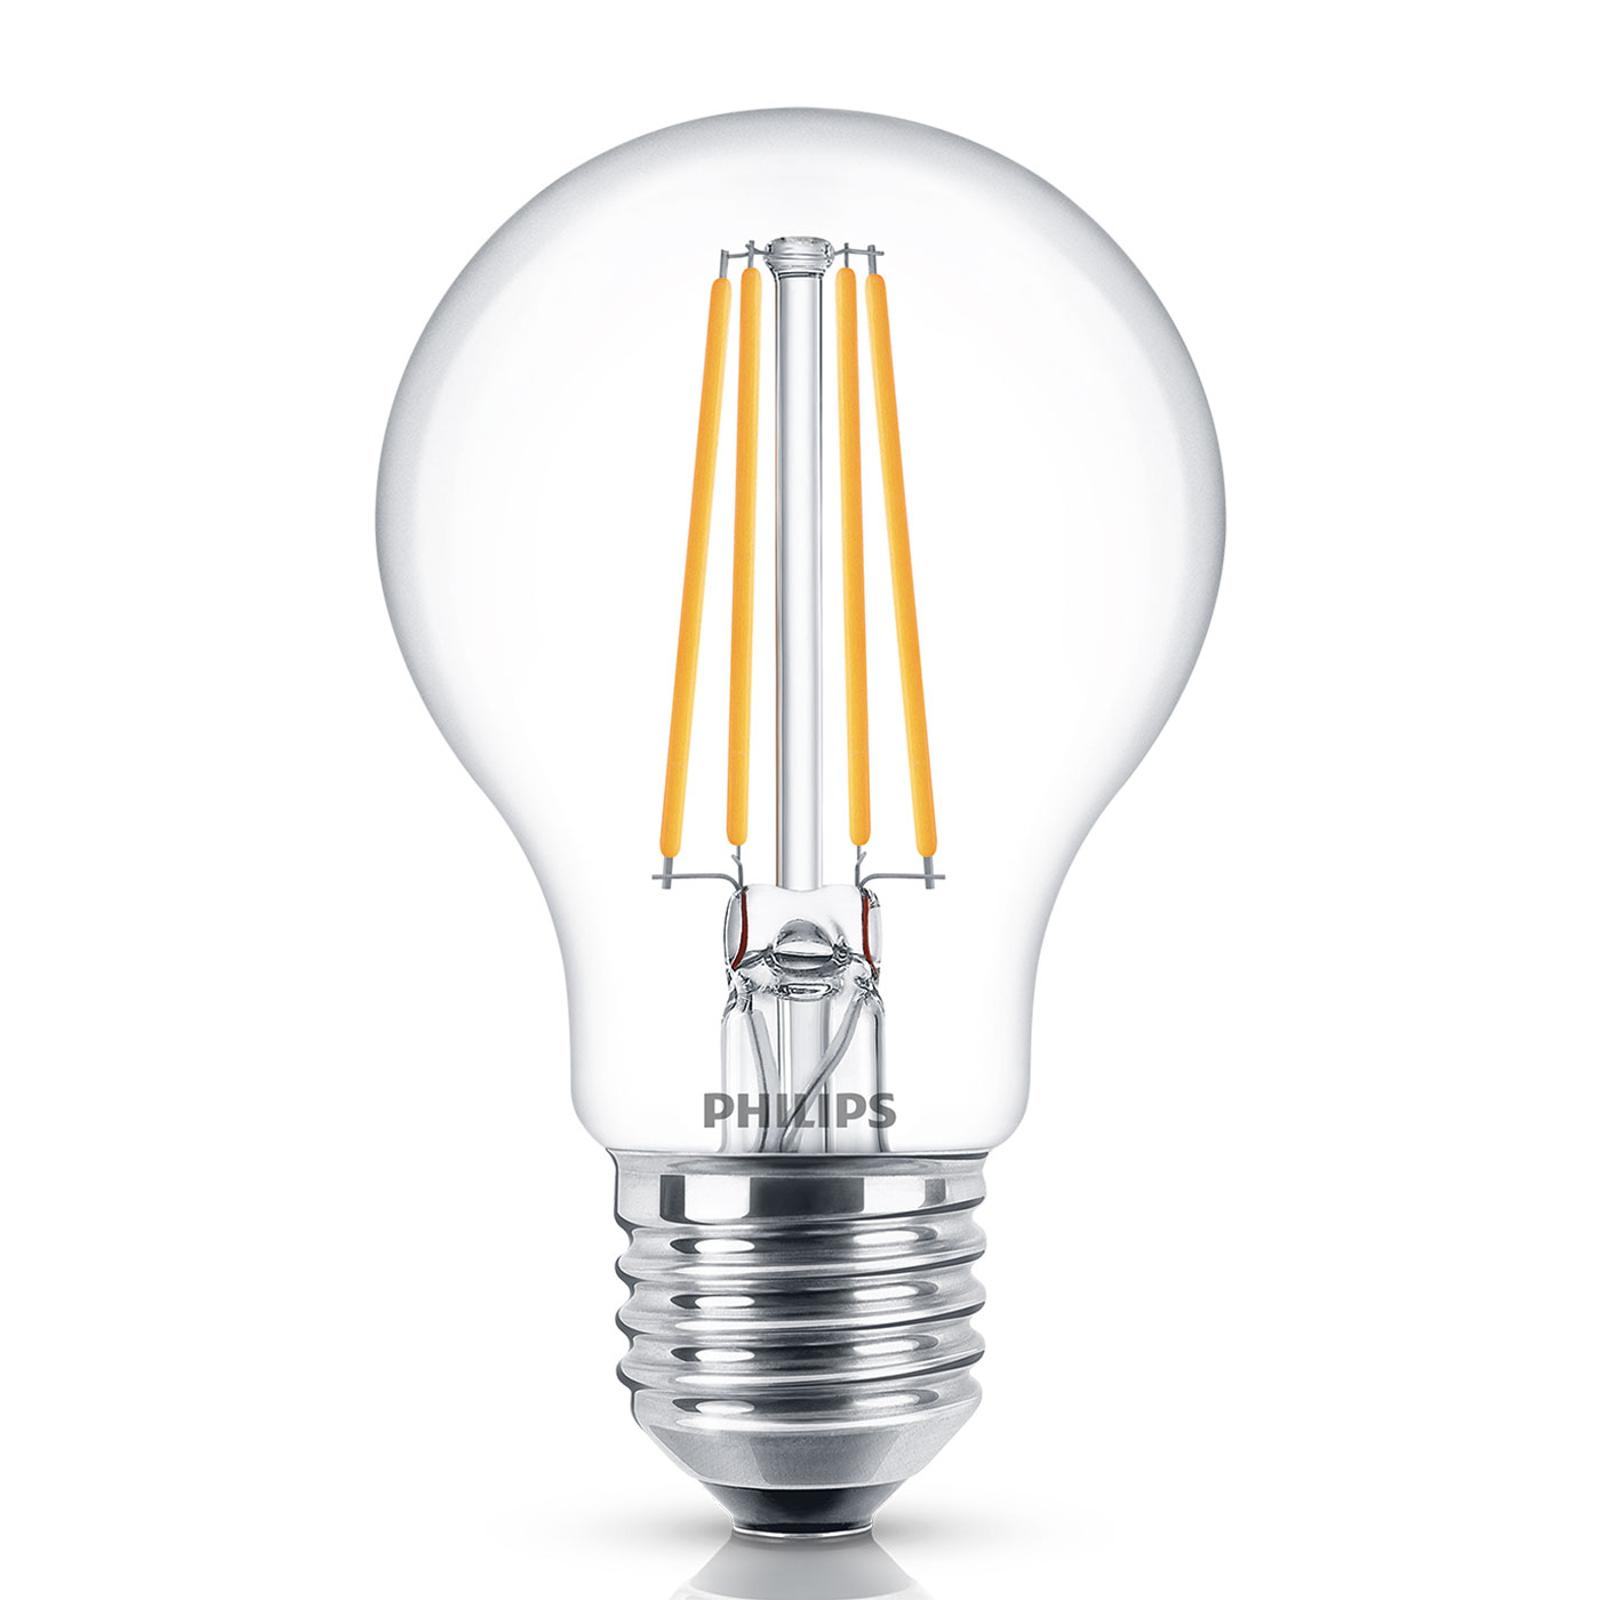 Philips Classic żarówka LED E27 A60 7W 4000K